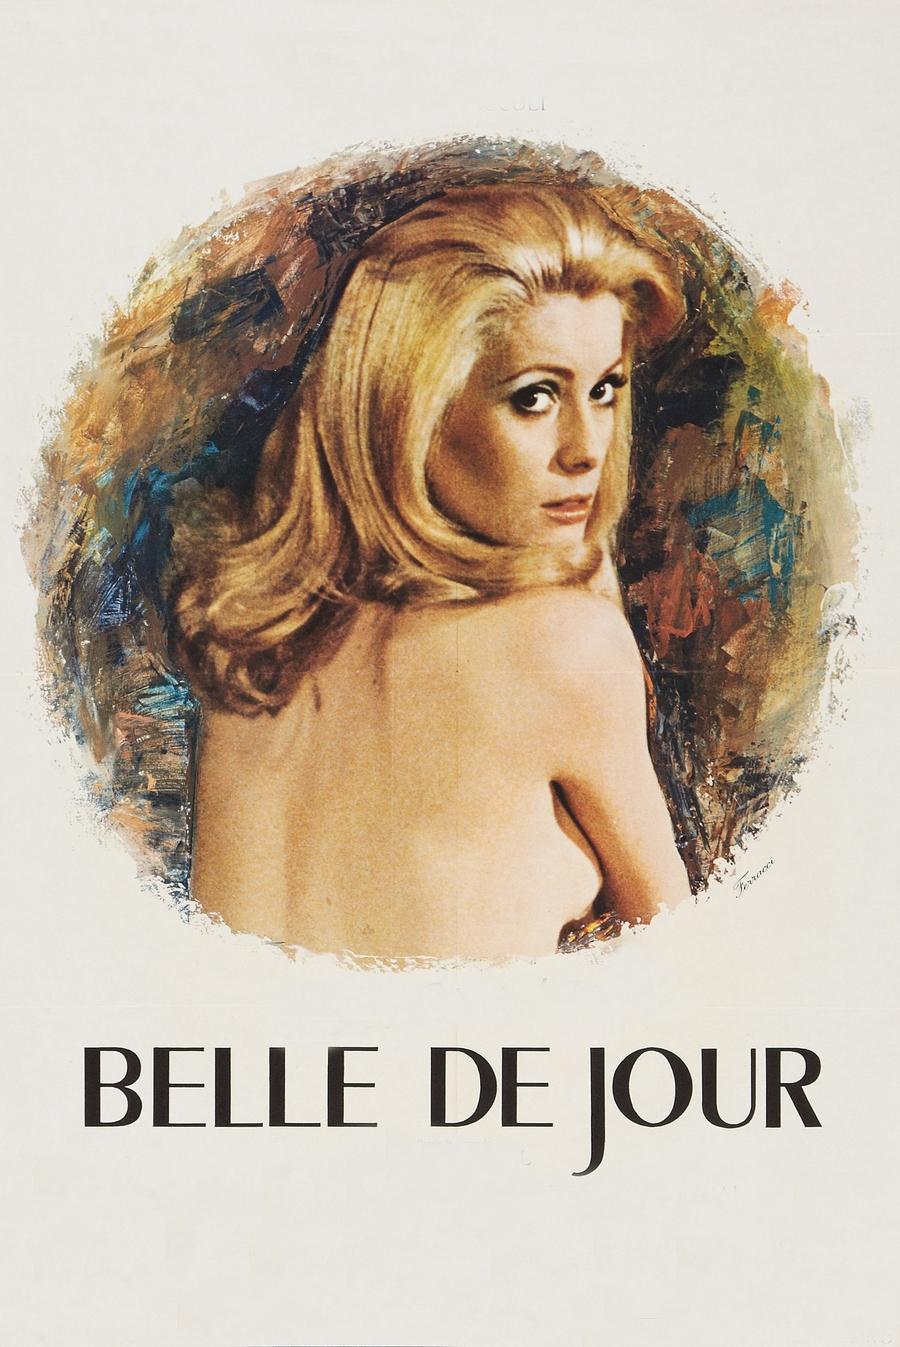 Belle de Jour (Bella de día)